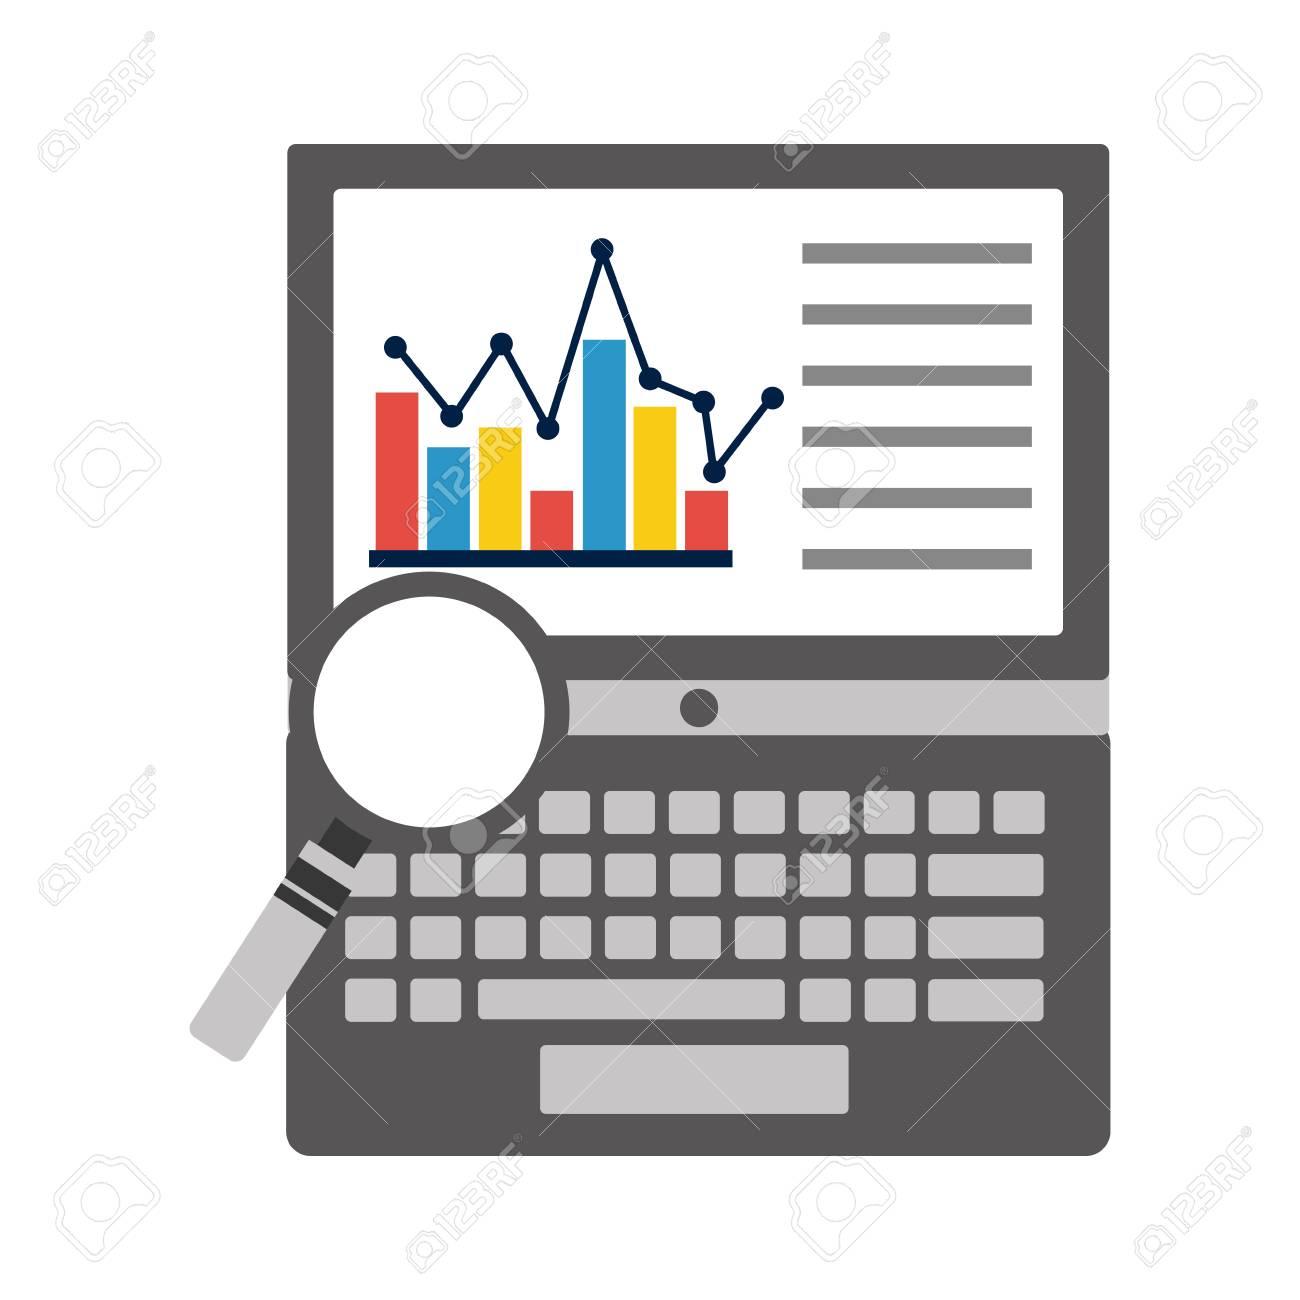 hight resolution of laptop screen diagram wiring library diagram h9 laptop computer diagram laptop screen diagram